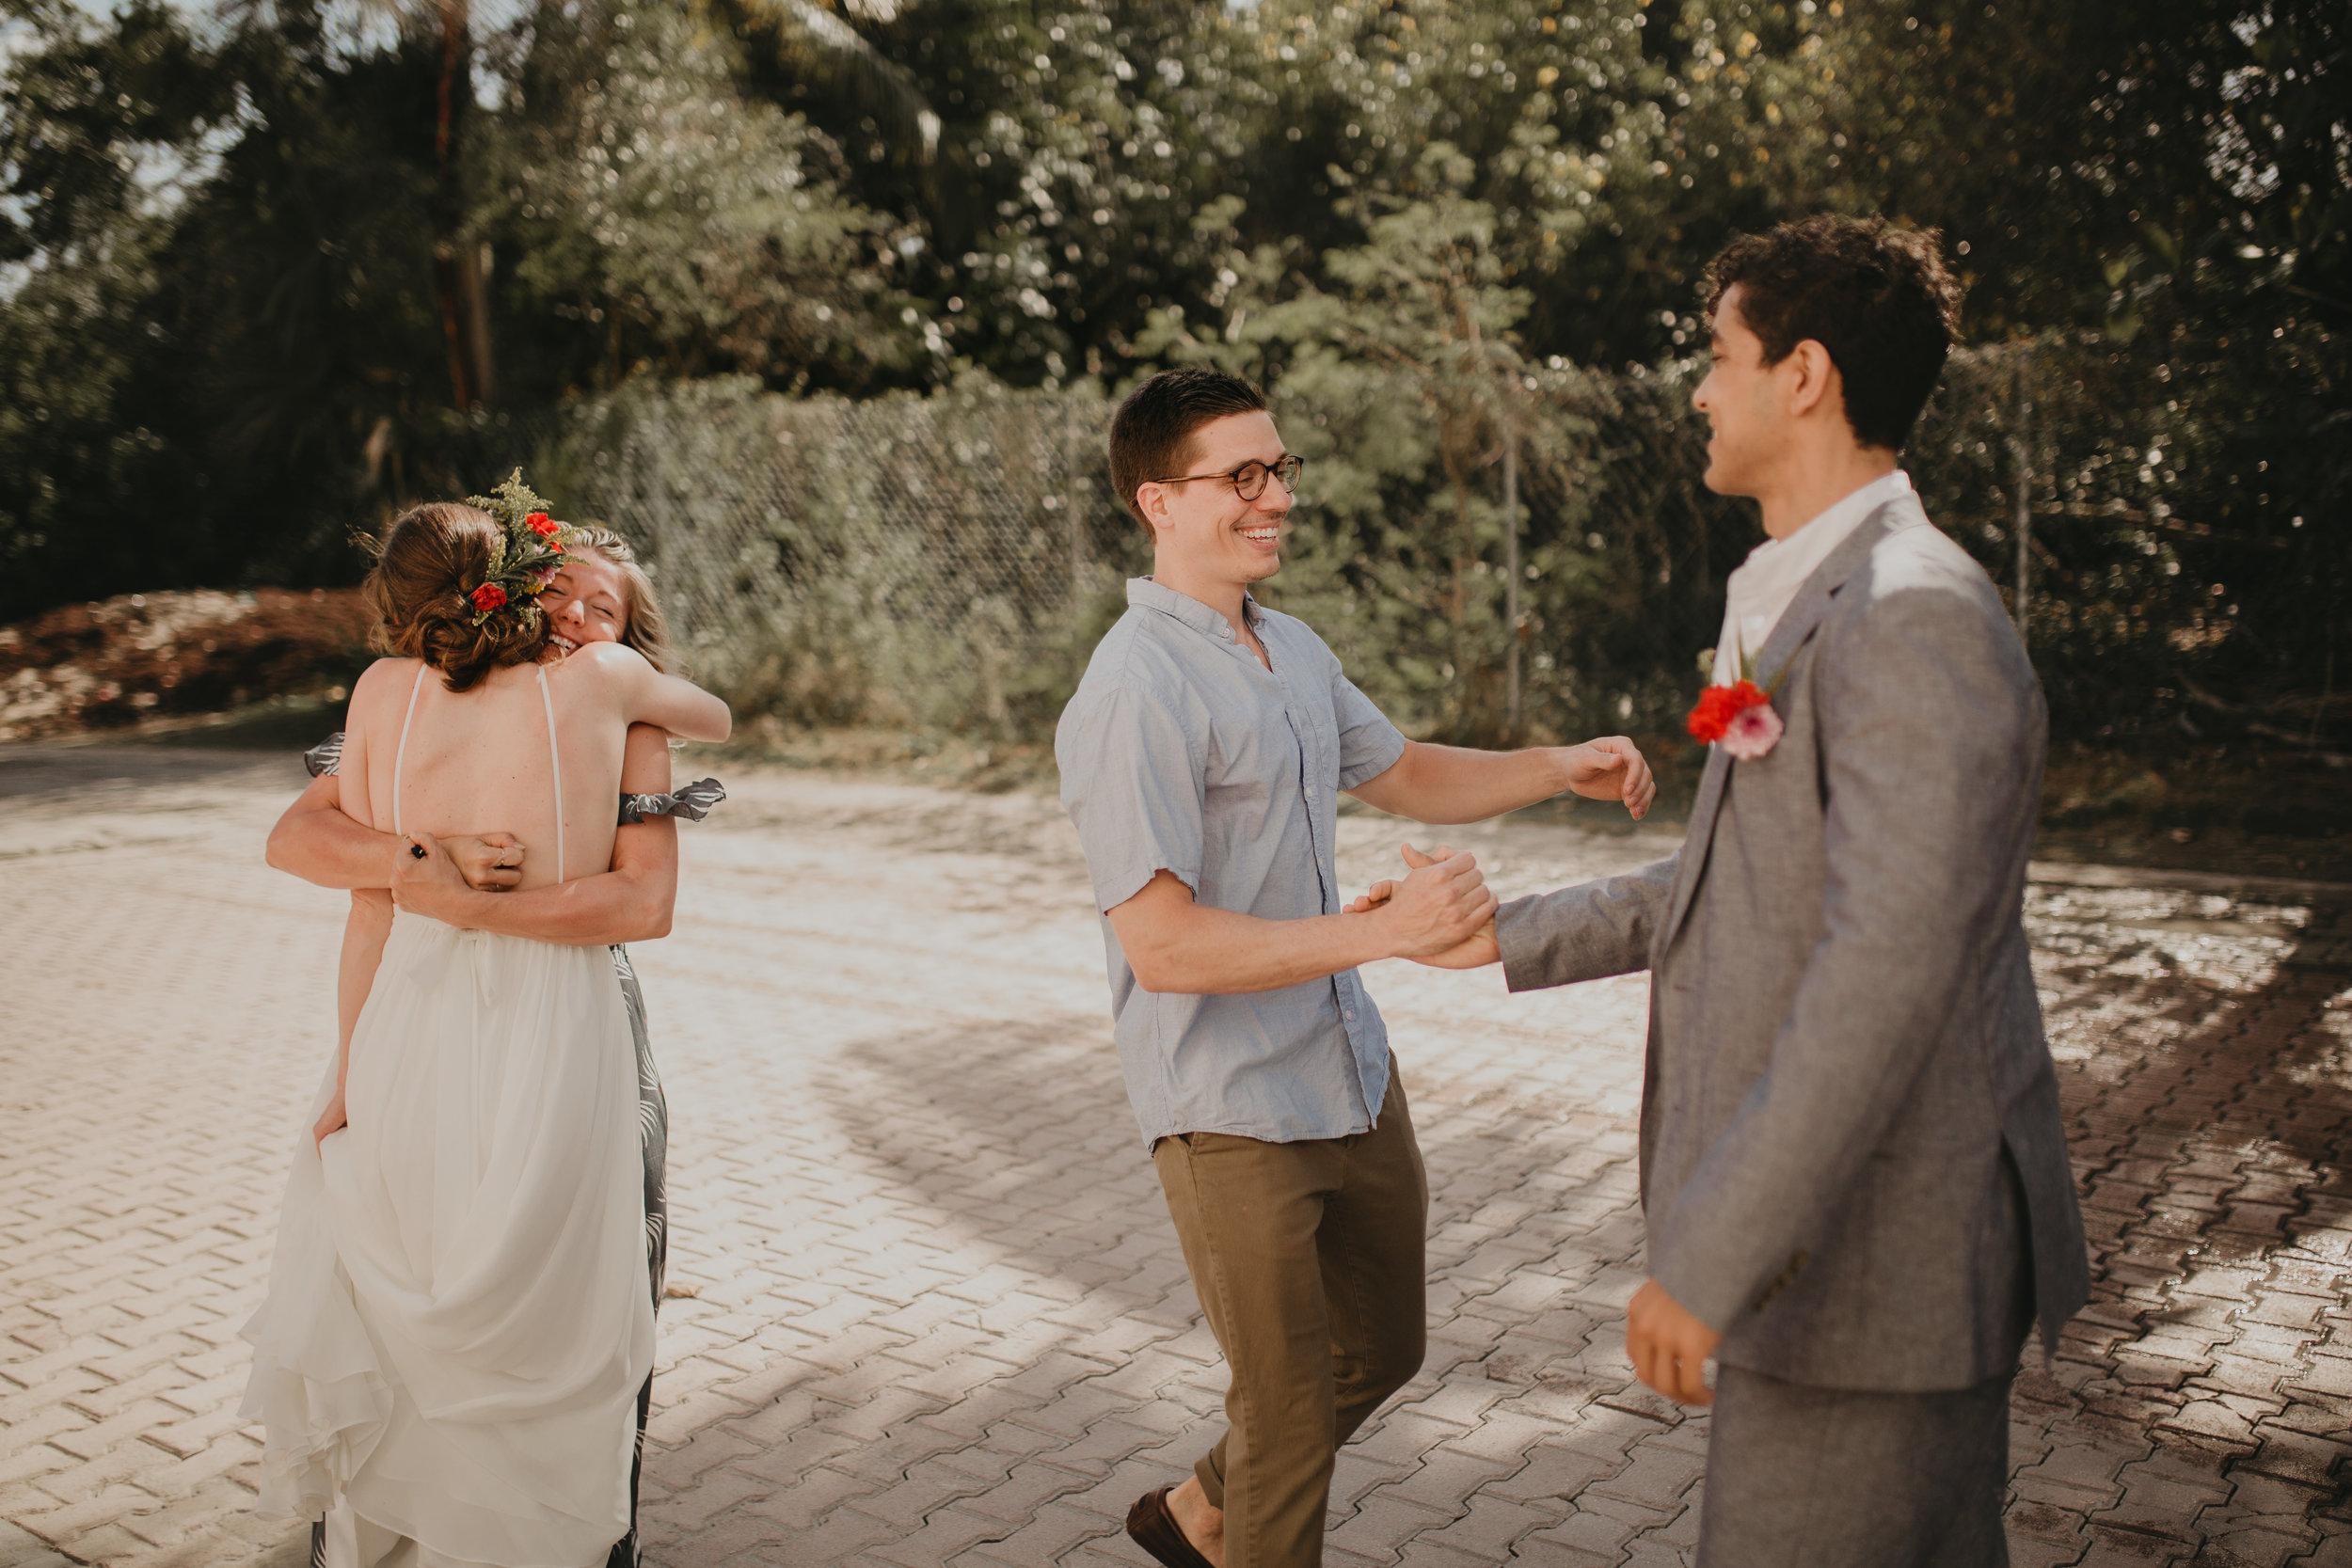 Nicole-Daacke-Photography-beachfront-akumal-destionation-wedding-tulum-mexico-elopement-photographer-destination-wedding-inspiration-sunset-champagne-pop-boho-bride-ocean-tropical-bohemian-tulum-wedding-photos-138.jpg